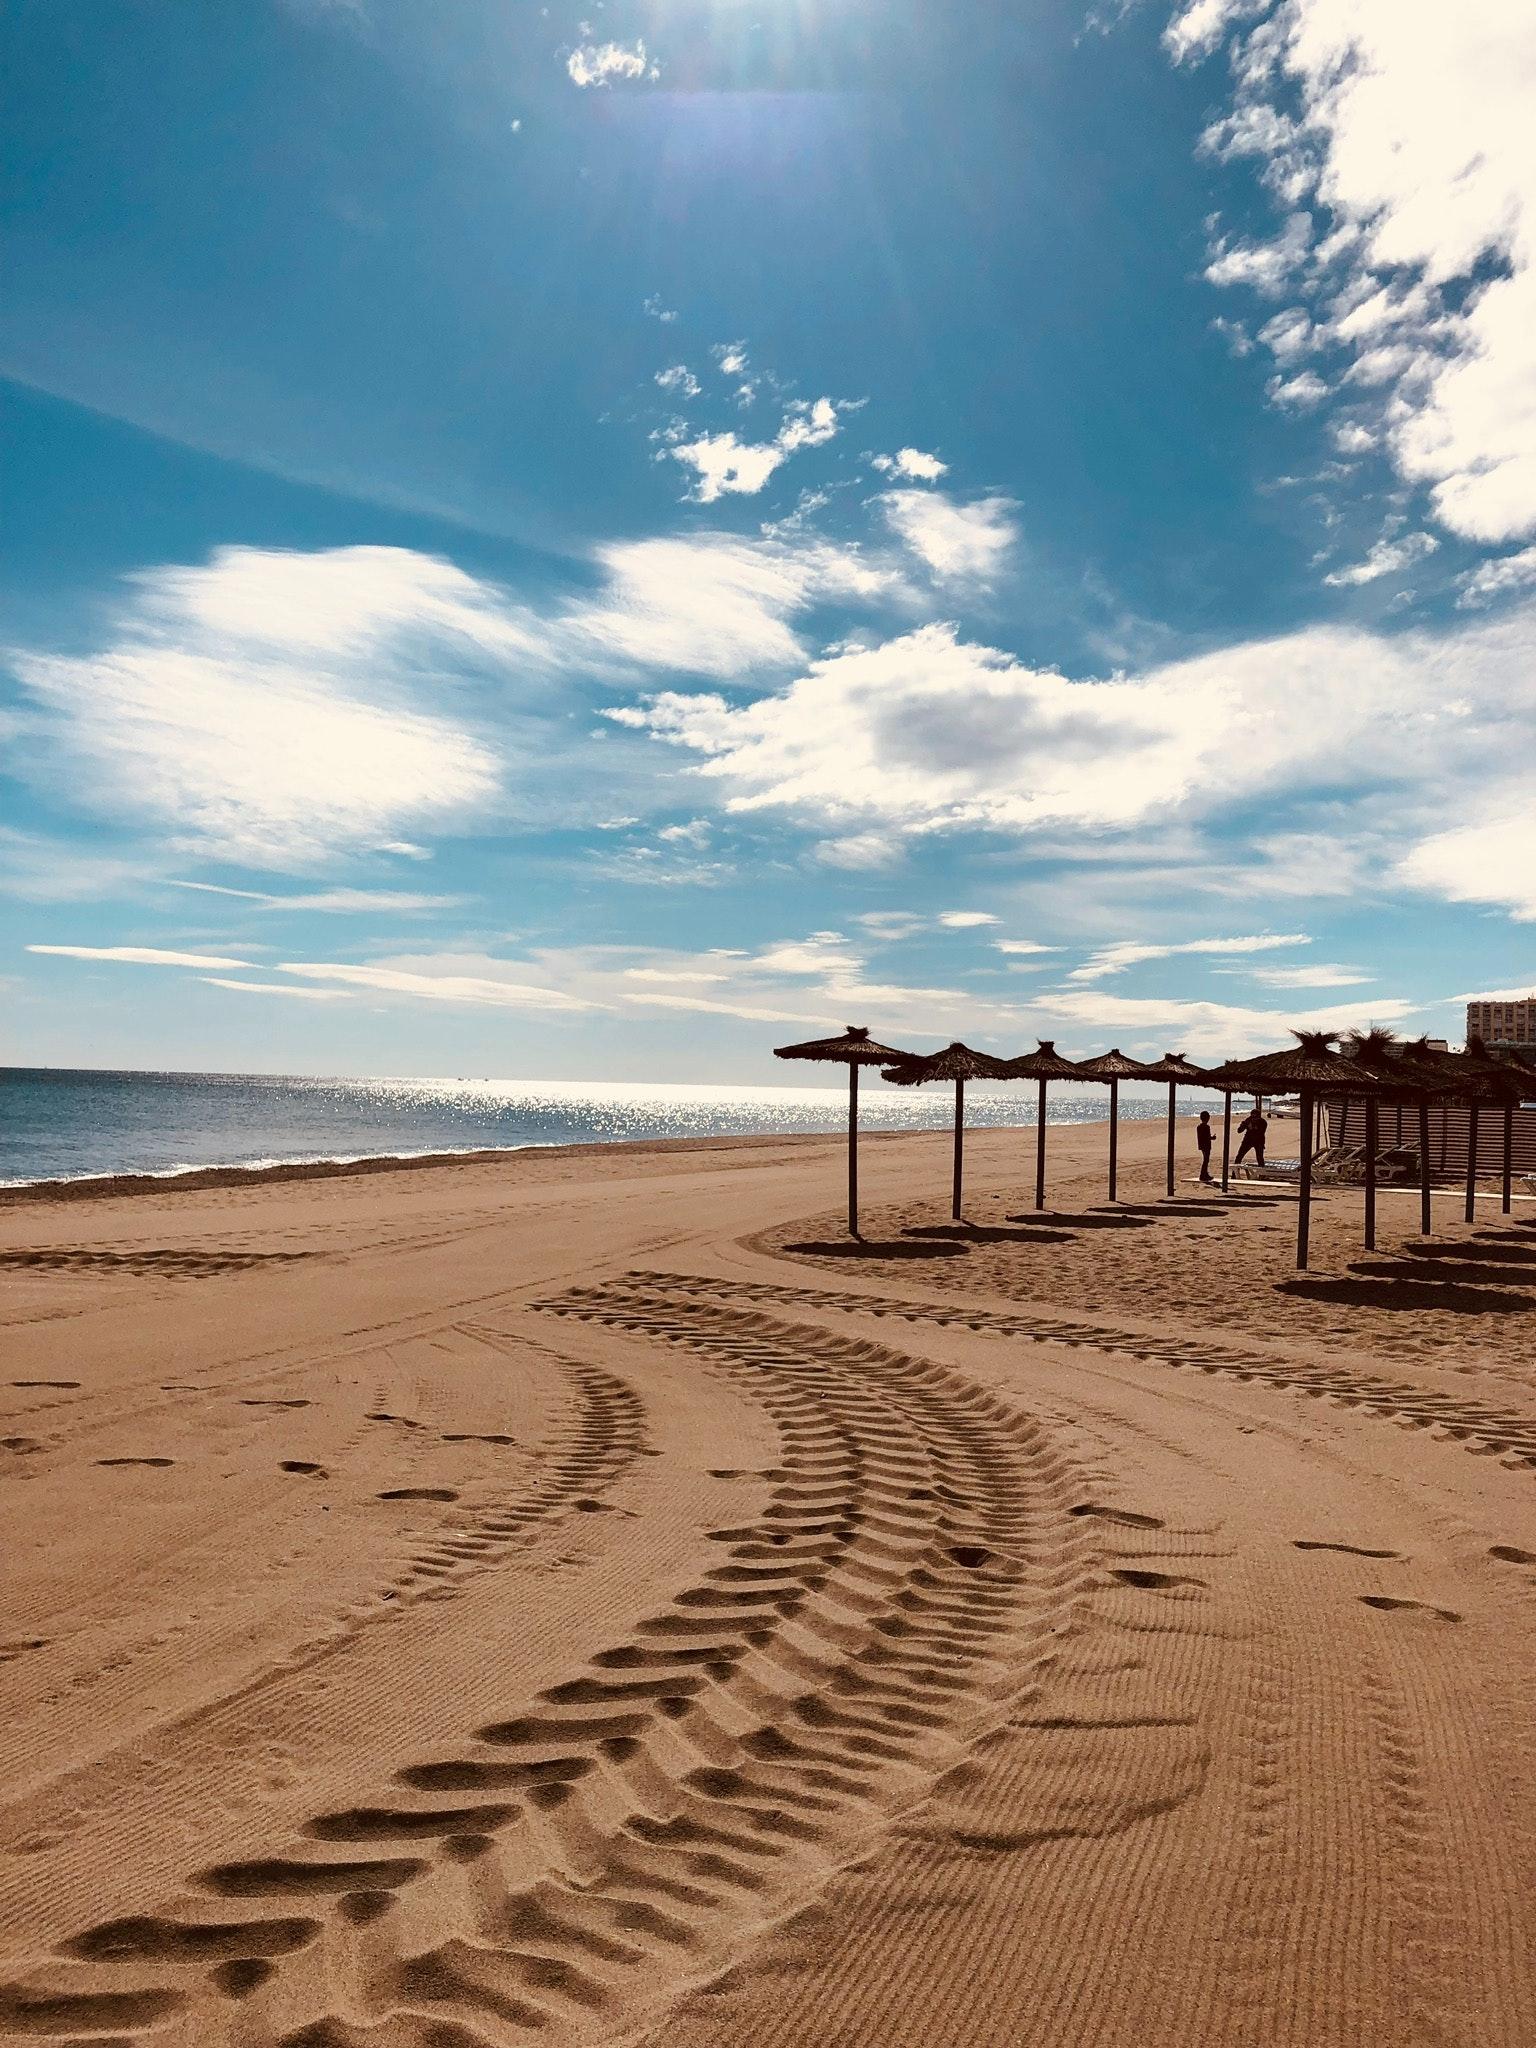 Brown sand near seashore under cloudy sky photo